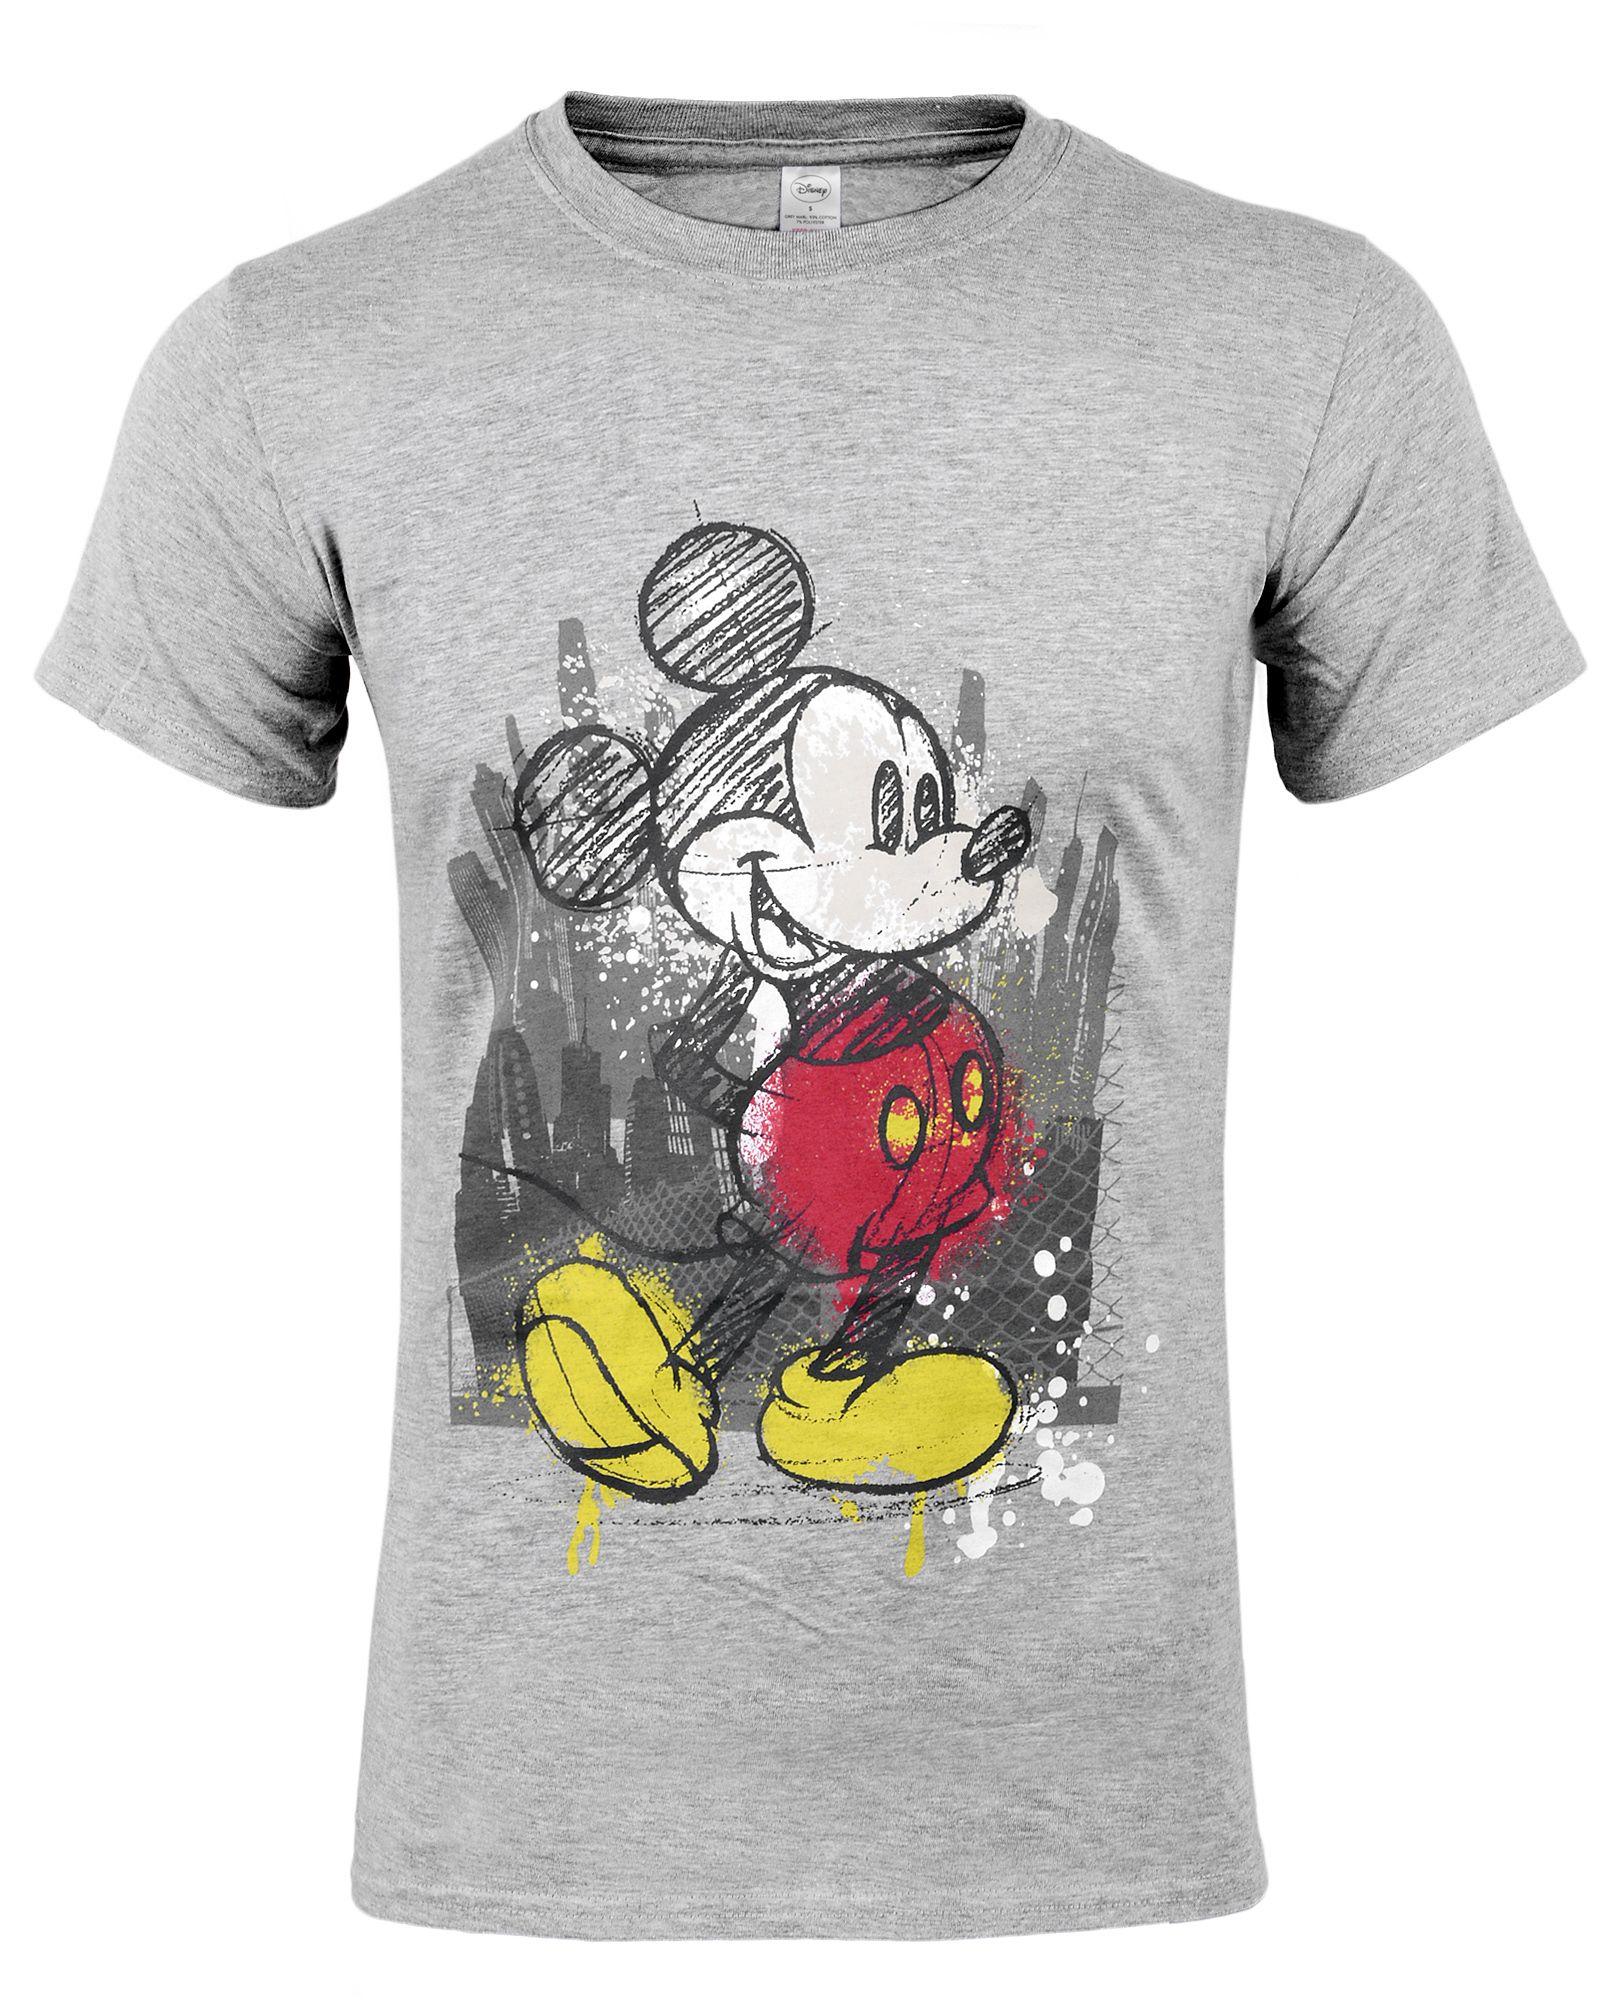 Тениска Micky Mouse - Tap, сива, размер XL - 1